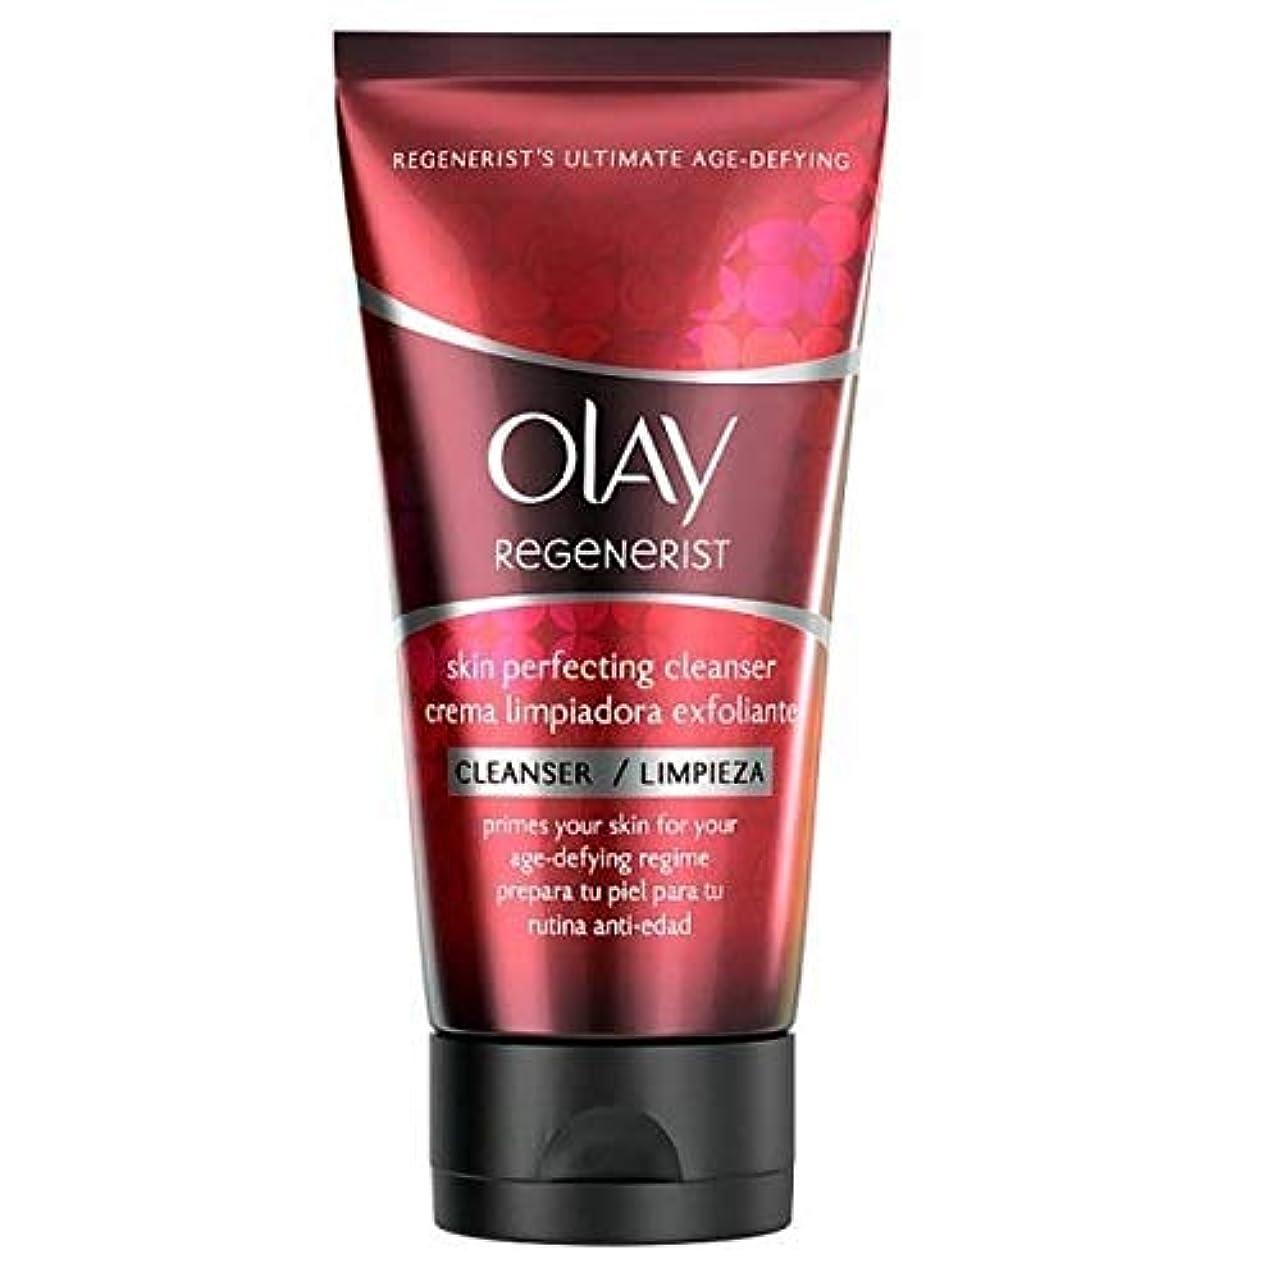 [Olay ] クレンザーを完成オーレイリジェネスキン - Olay Regenerist Skin Perfecting Cleanser [並行輸入品]